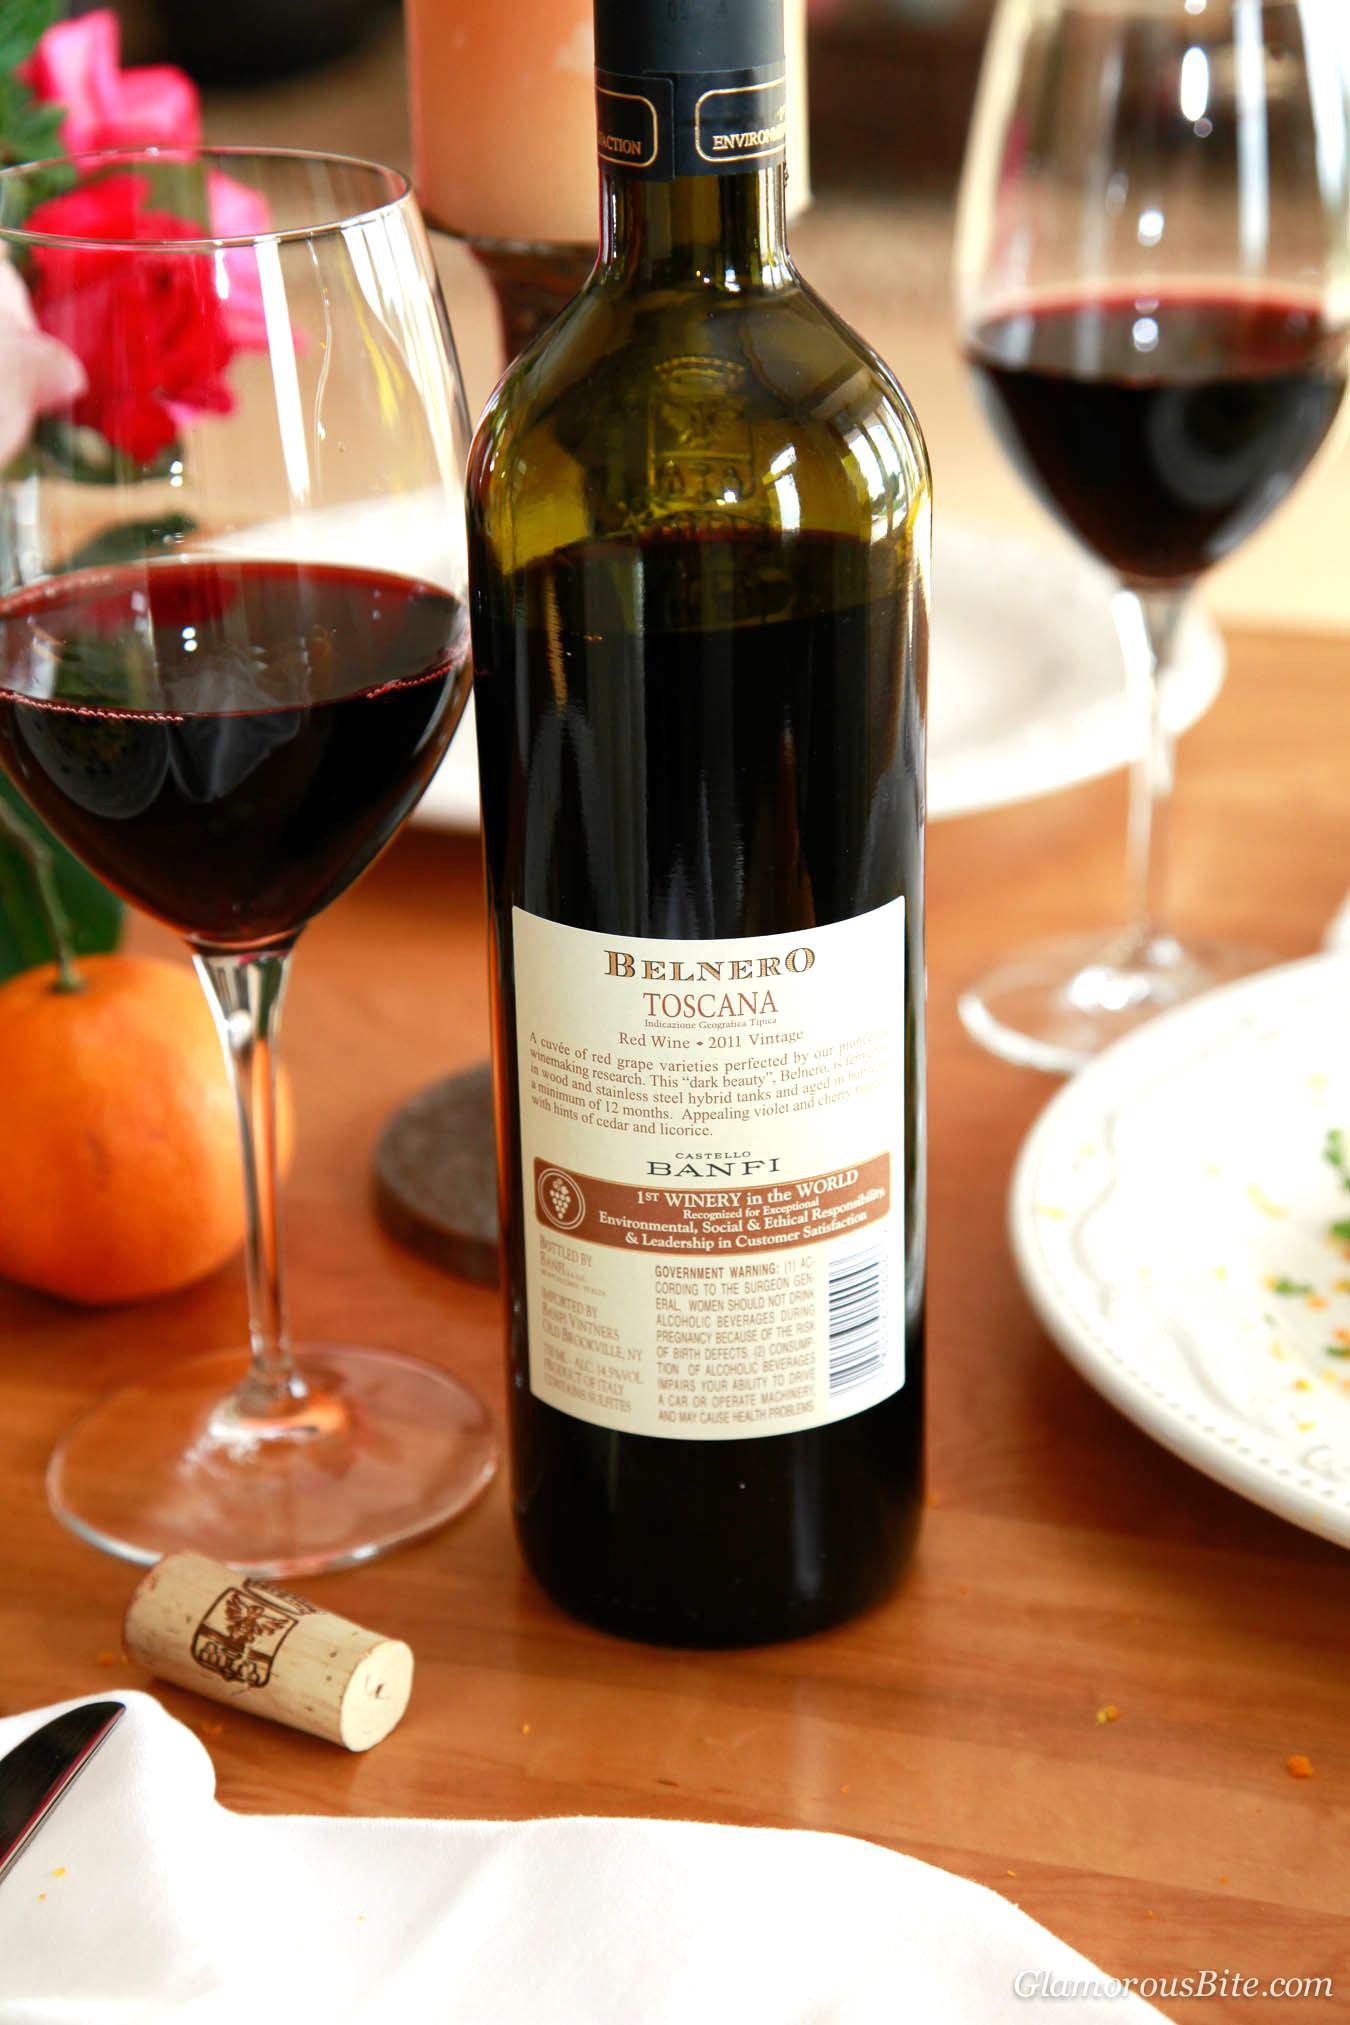 Red Wine Belnero Castello Banfi Italy